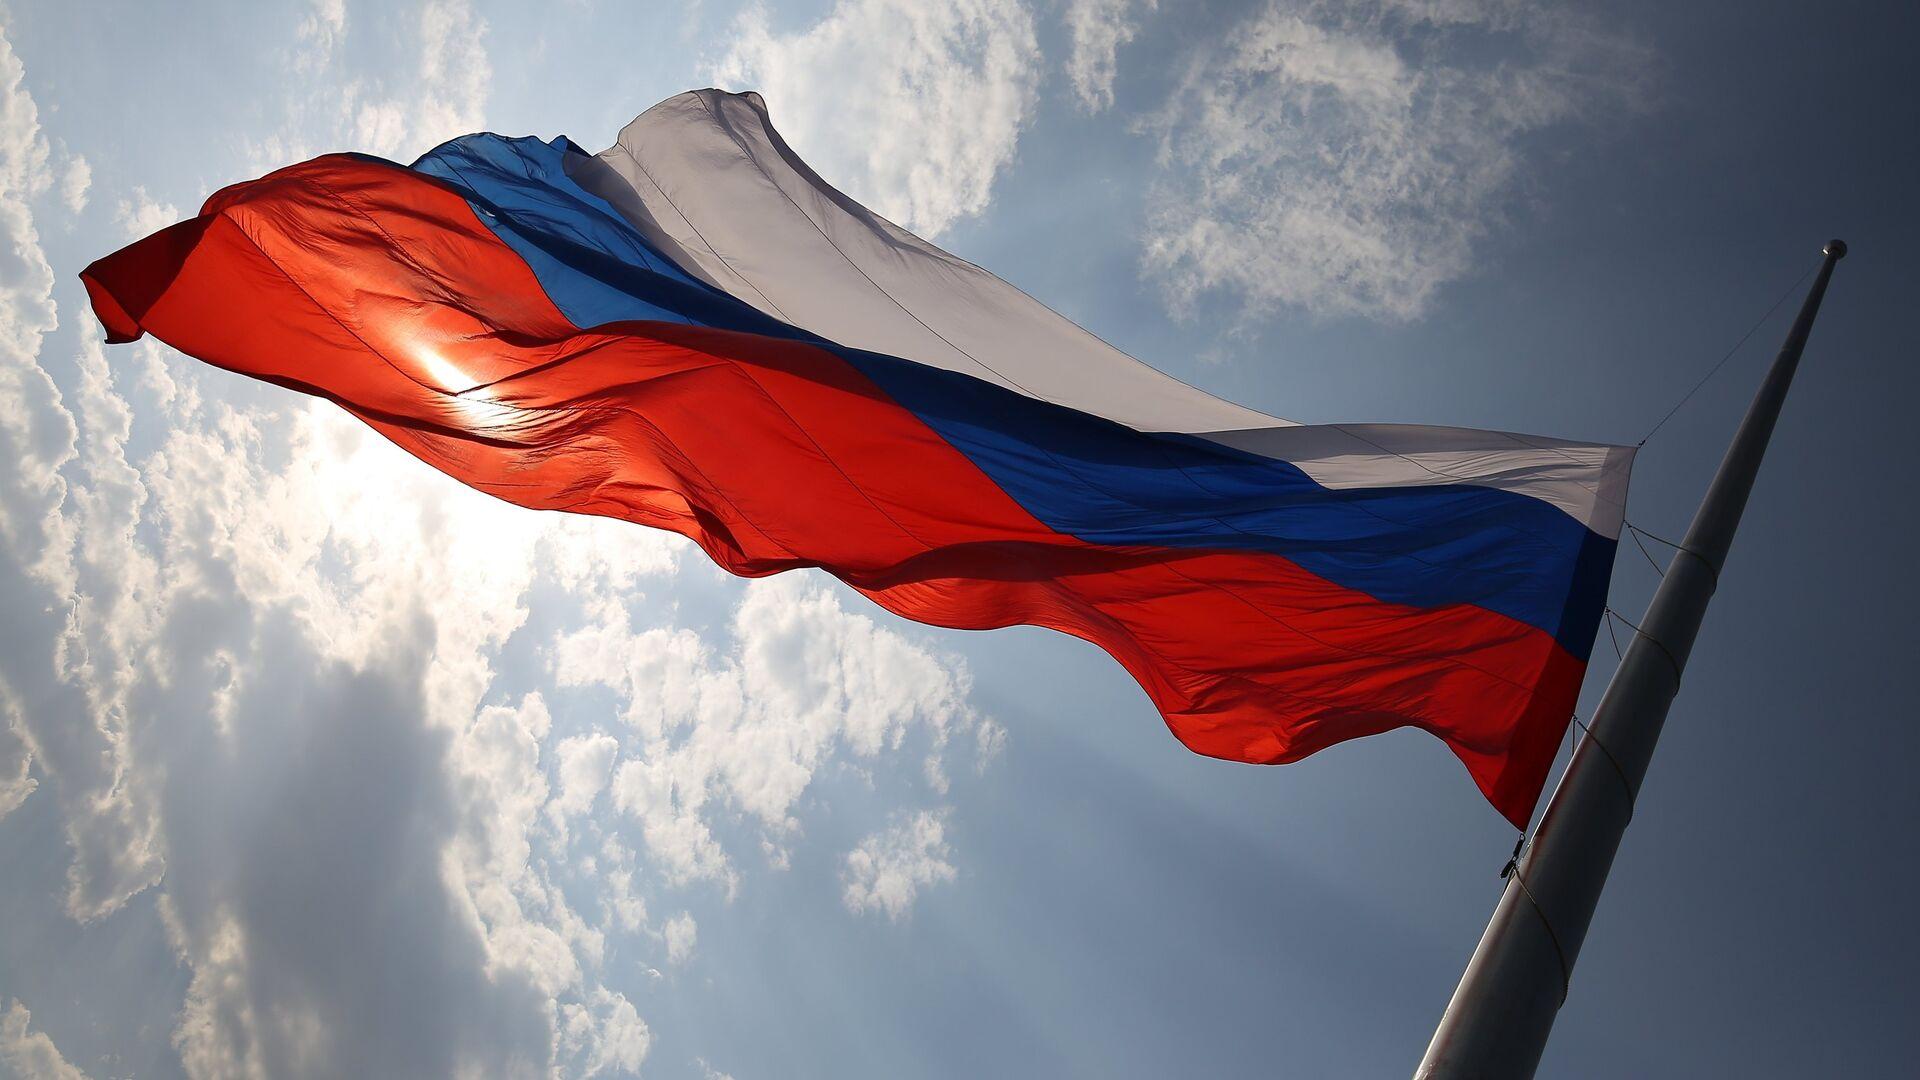 Bandera de Rusia (imagen referencial) - Sputnik Mundo, 1920, 14.05.2021